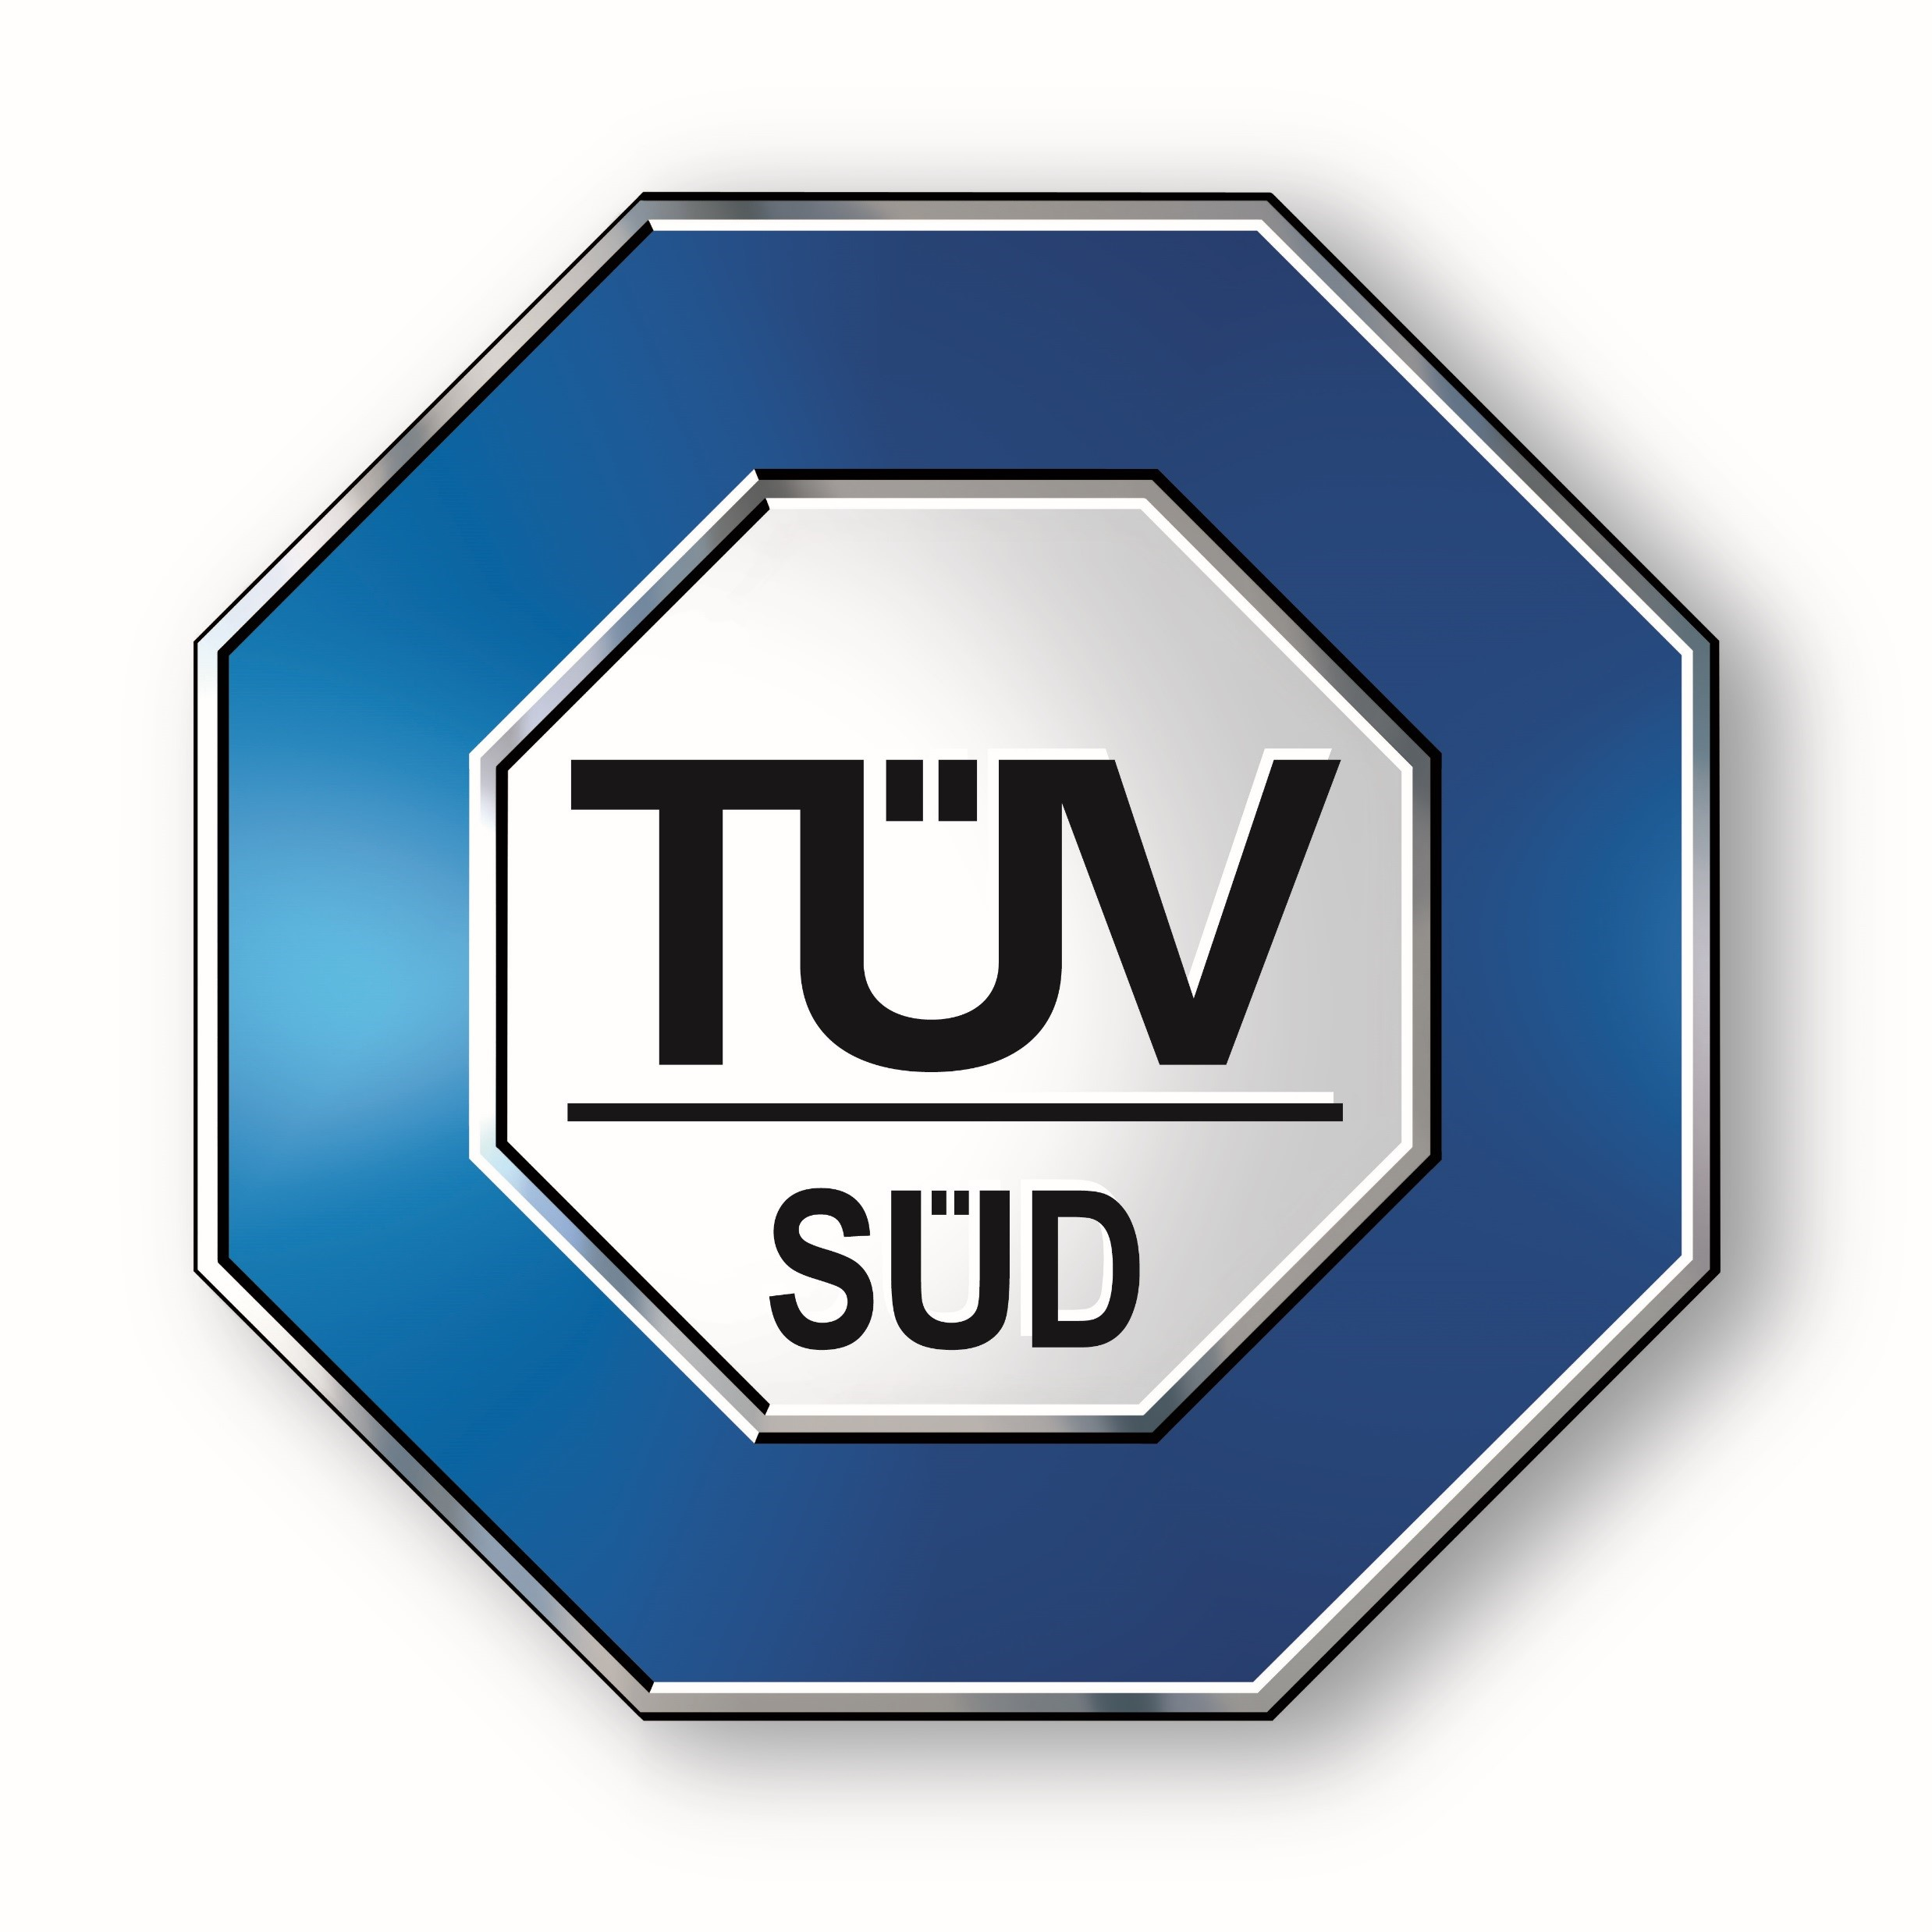 TUV南德认证检测集团